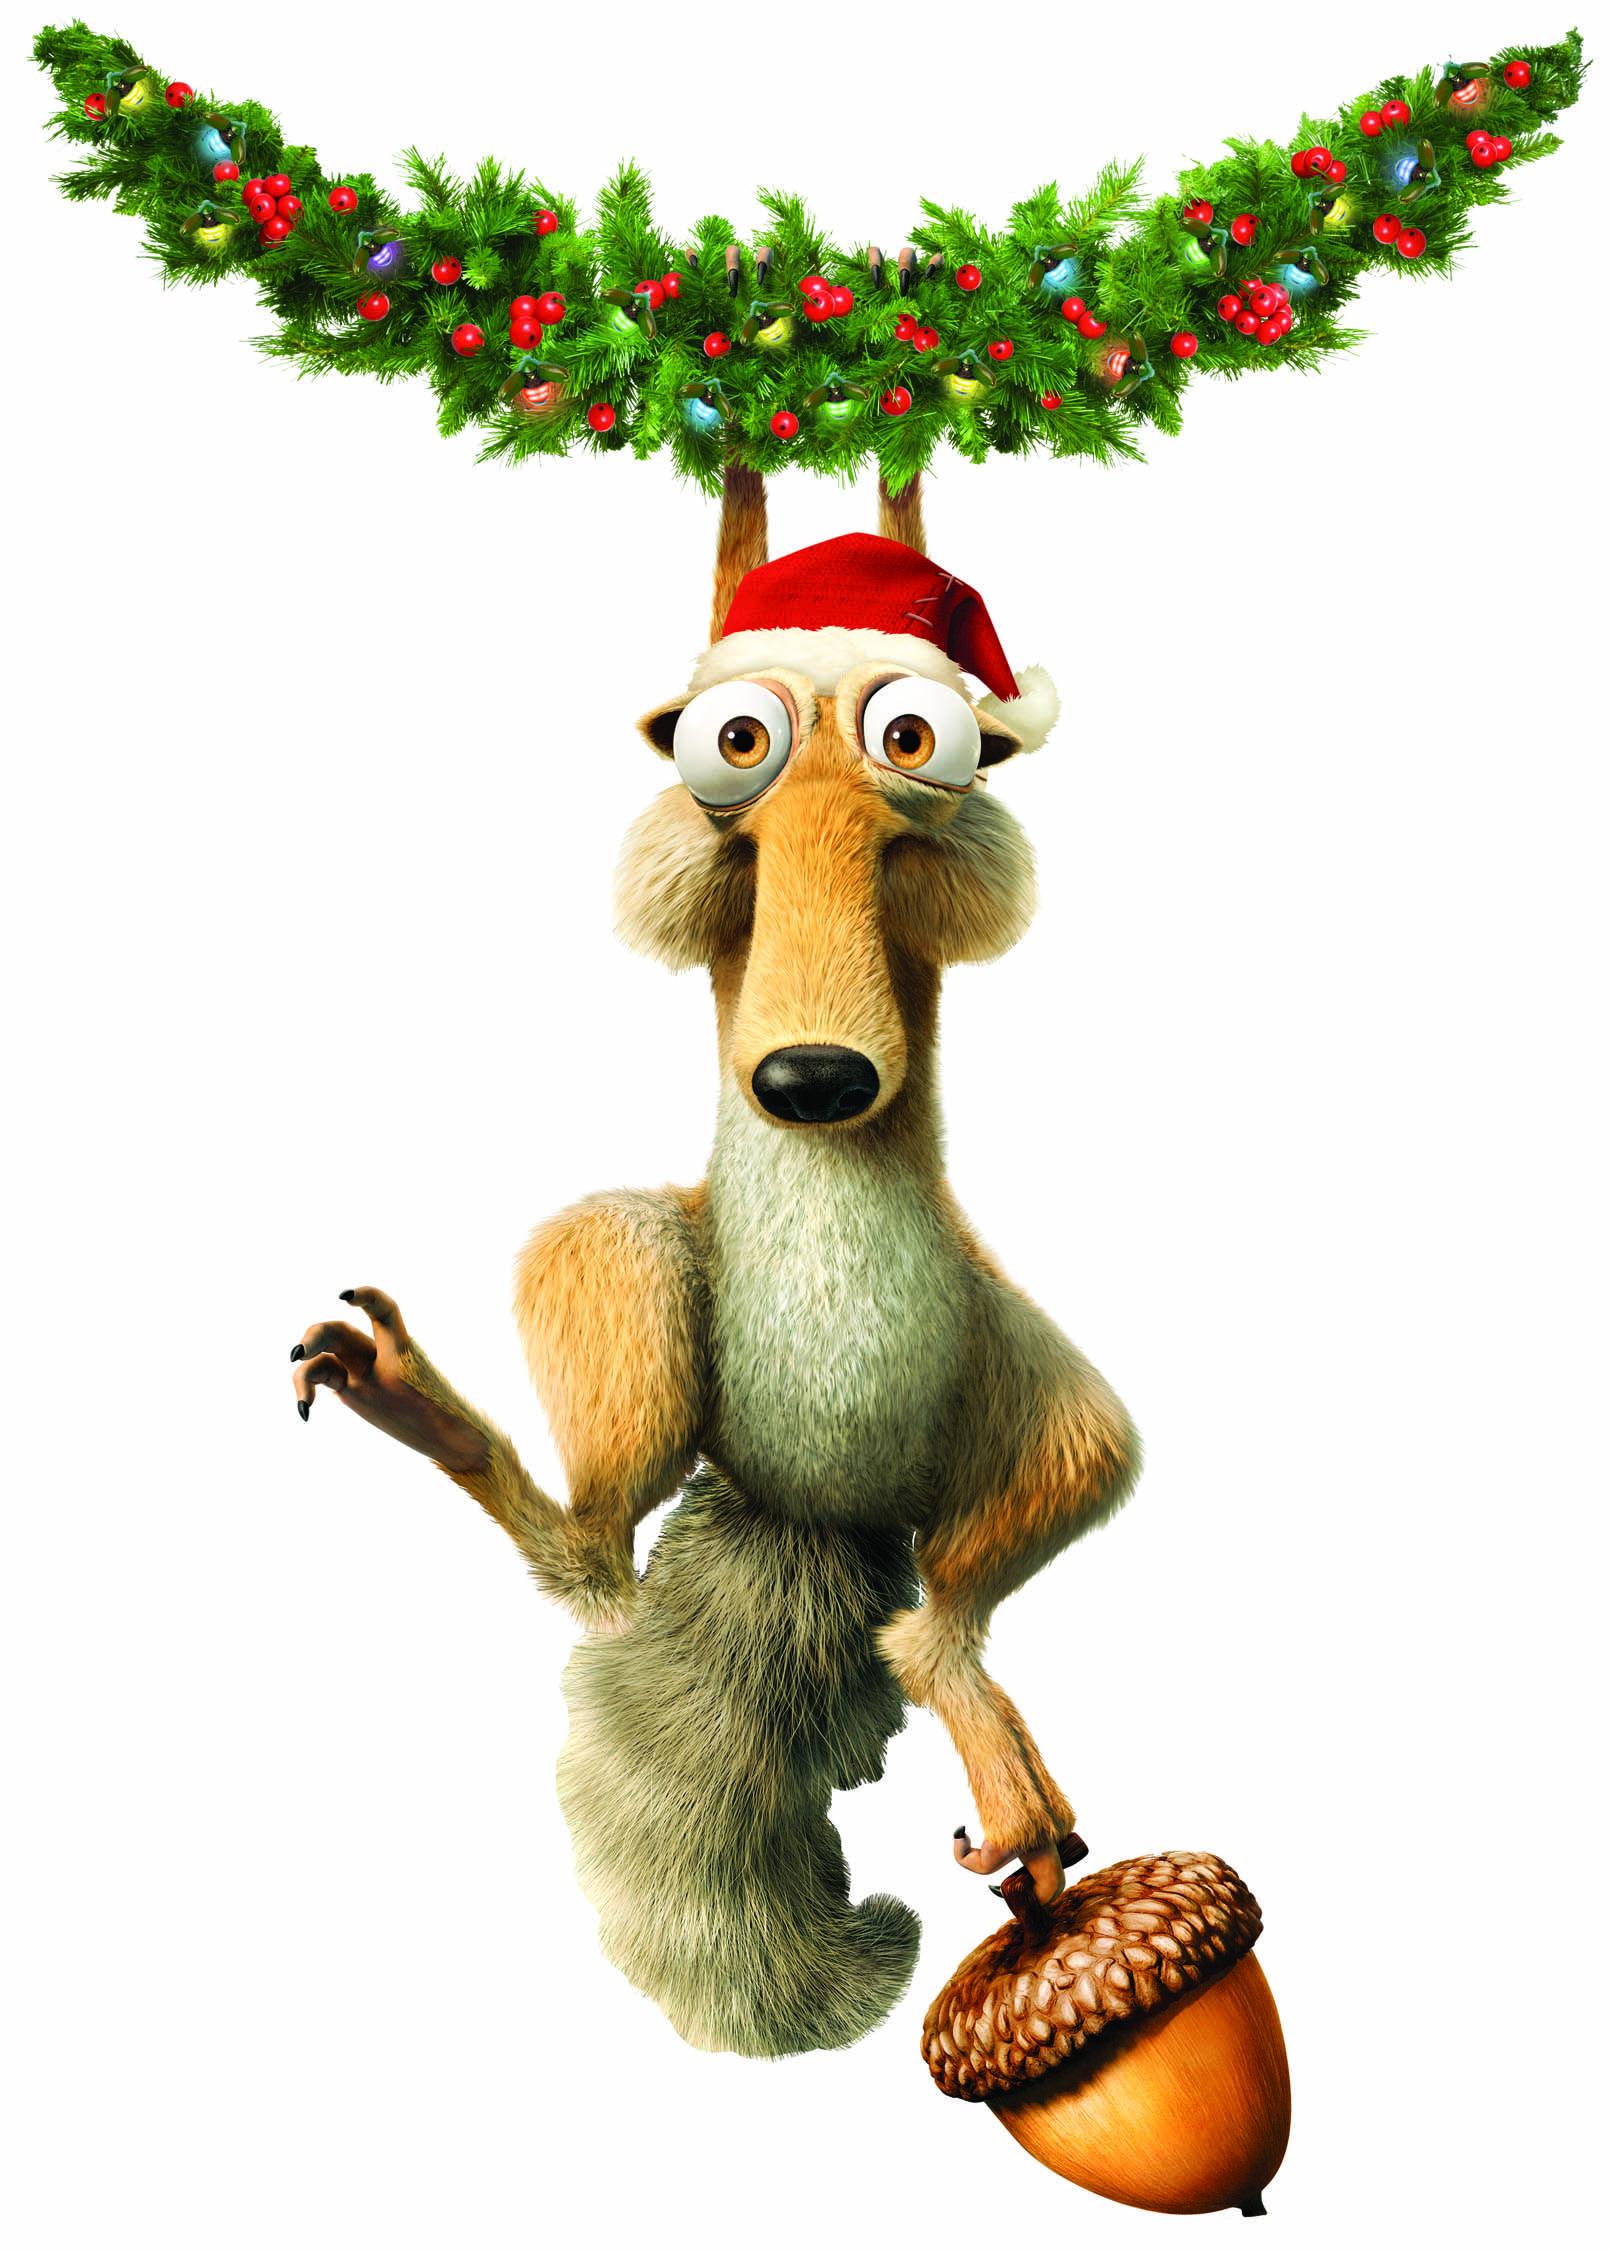 MERRY CHRISTMAS Tom: Scrat!!!!! | Holly Jolly in 2018 | Pinterest ...